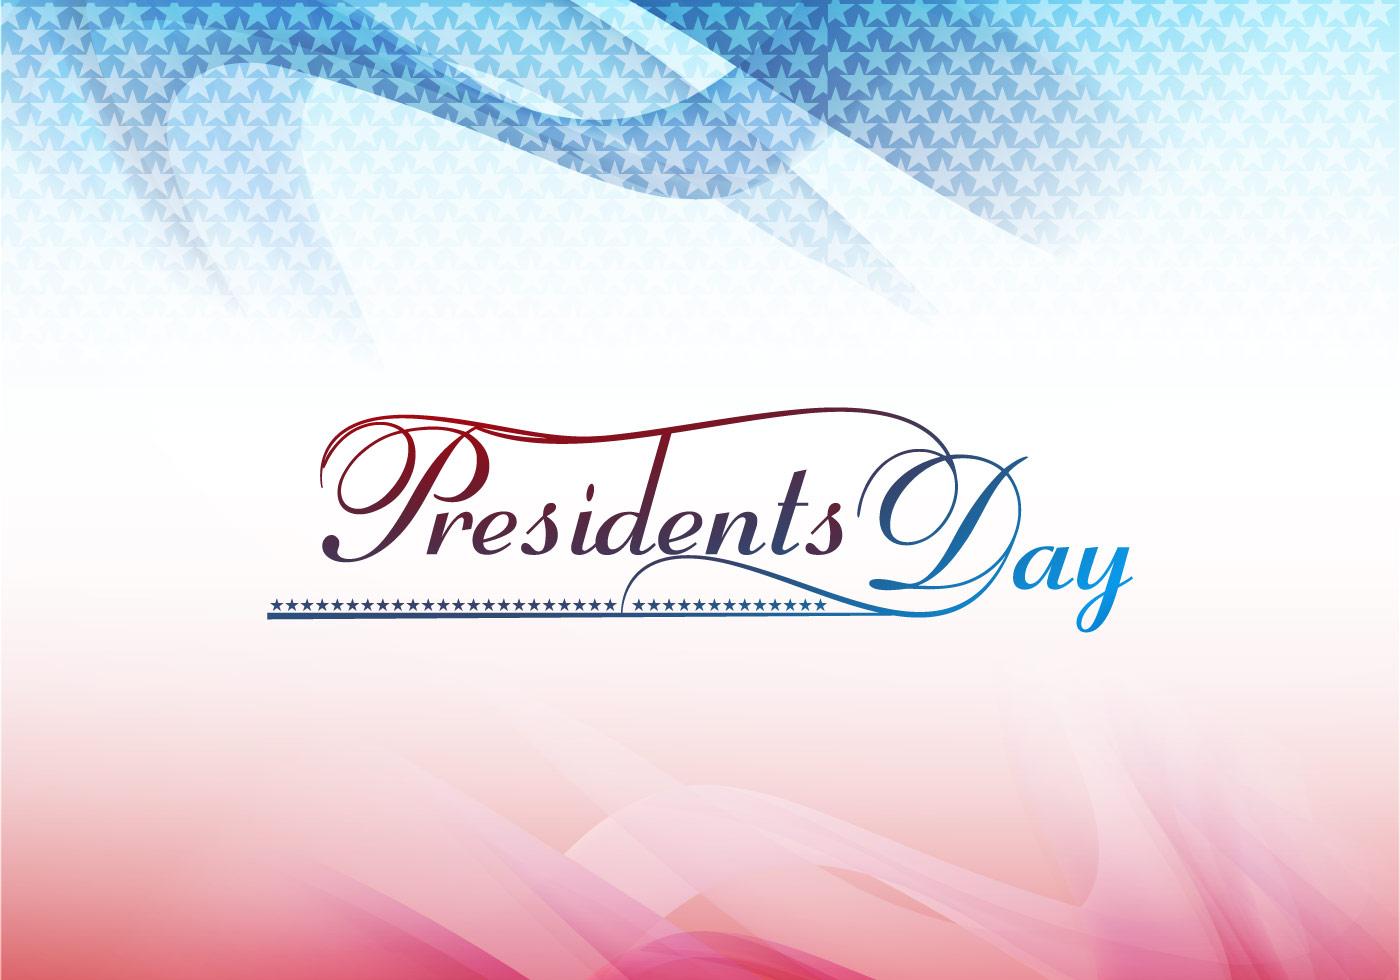 Presiden'ts Day jpeg